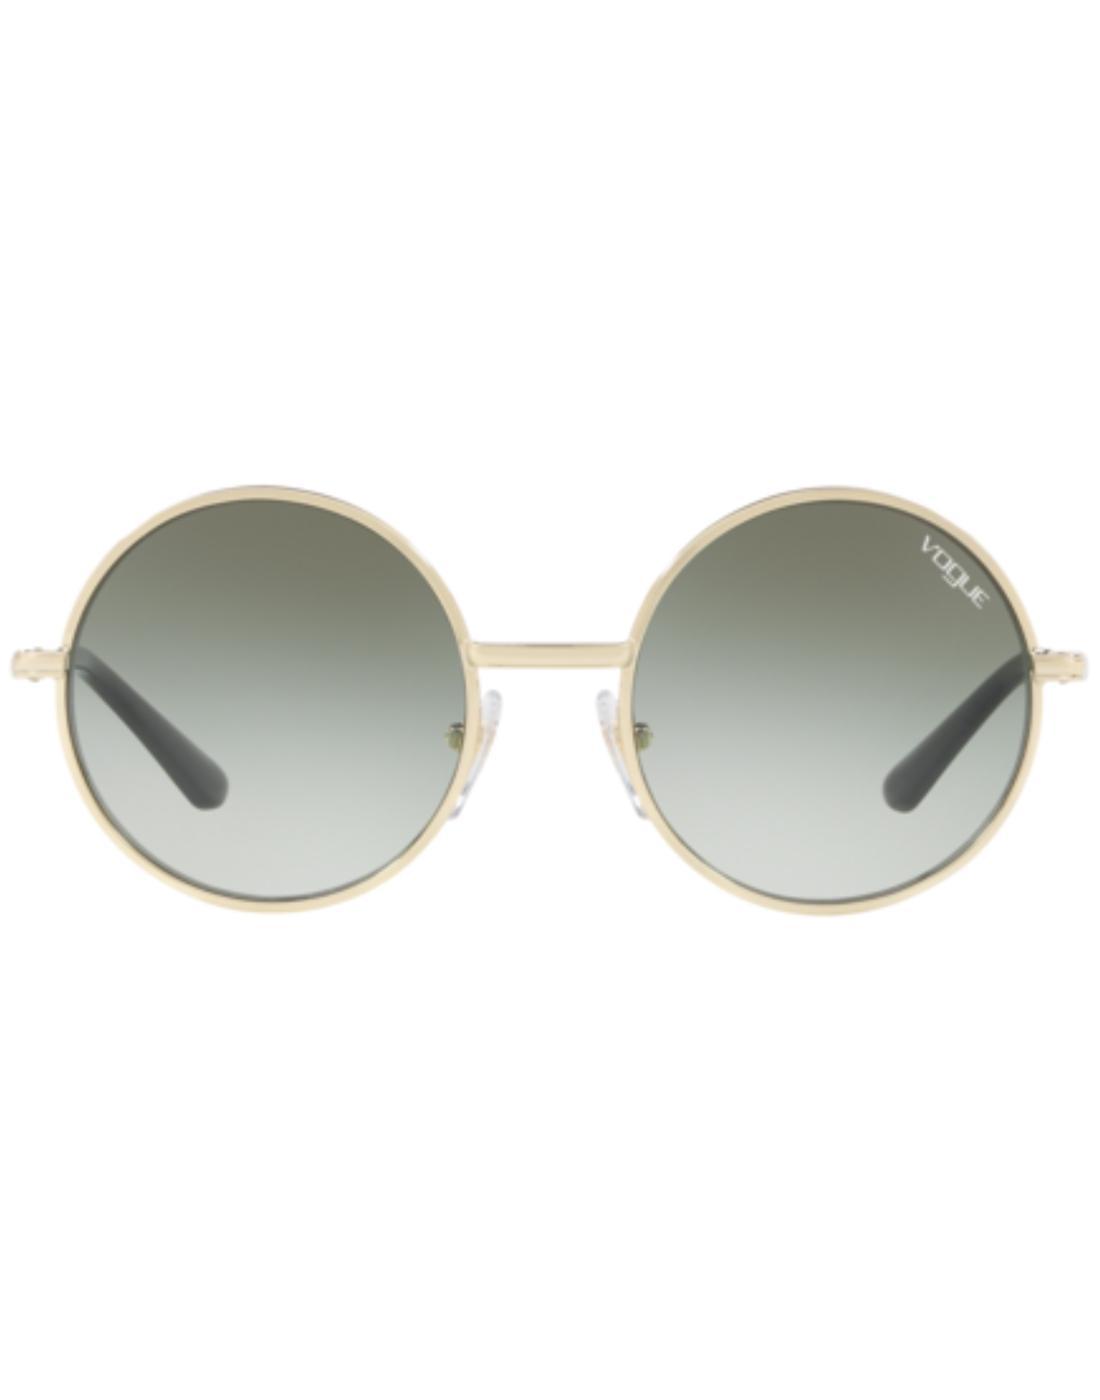 VOGUE Gigi Hadid Retro 60s Vintage Sunglasses G